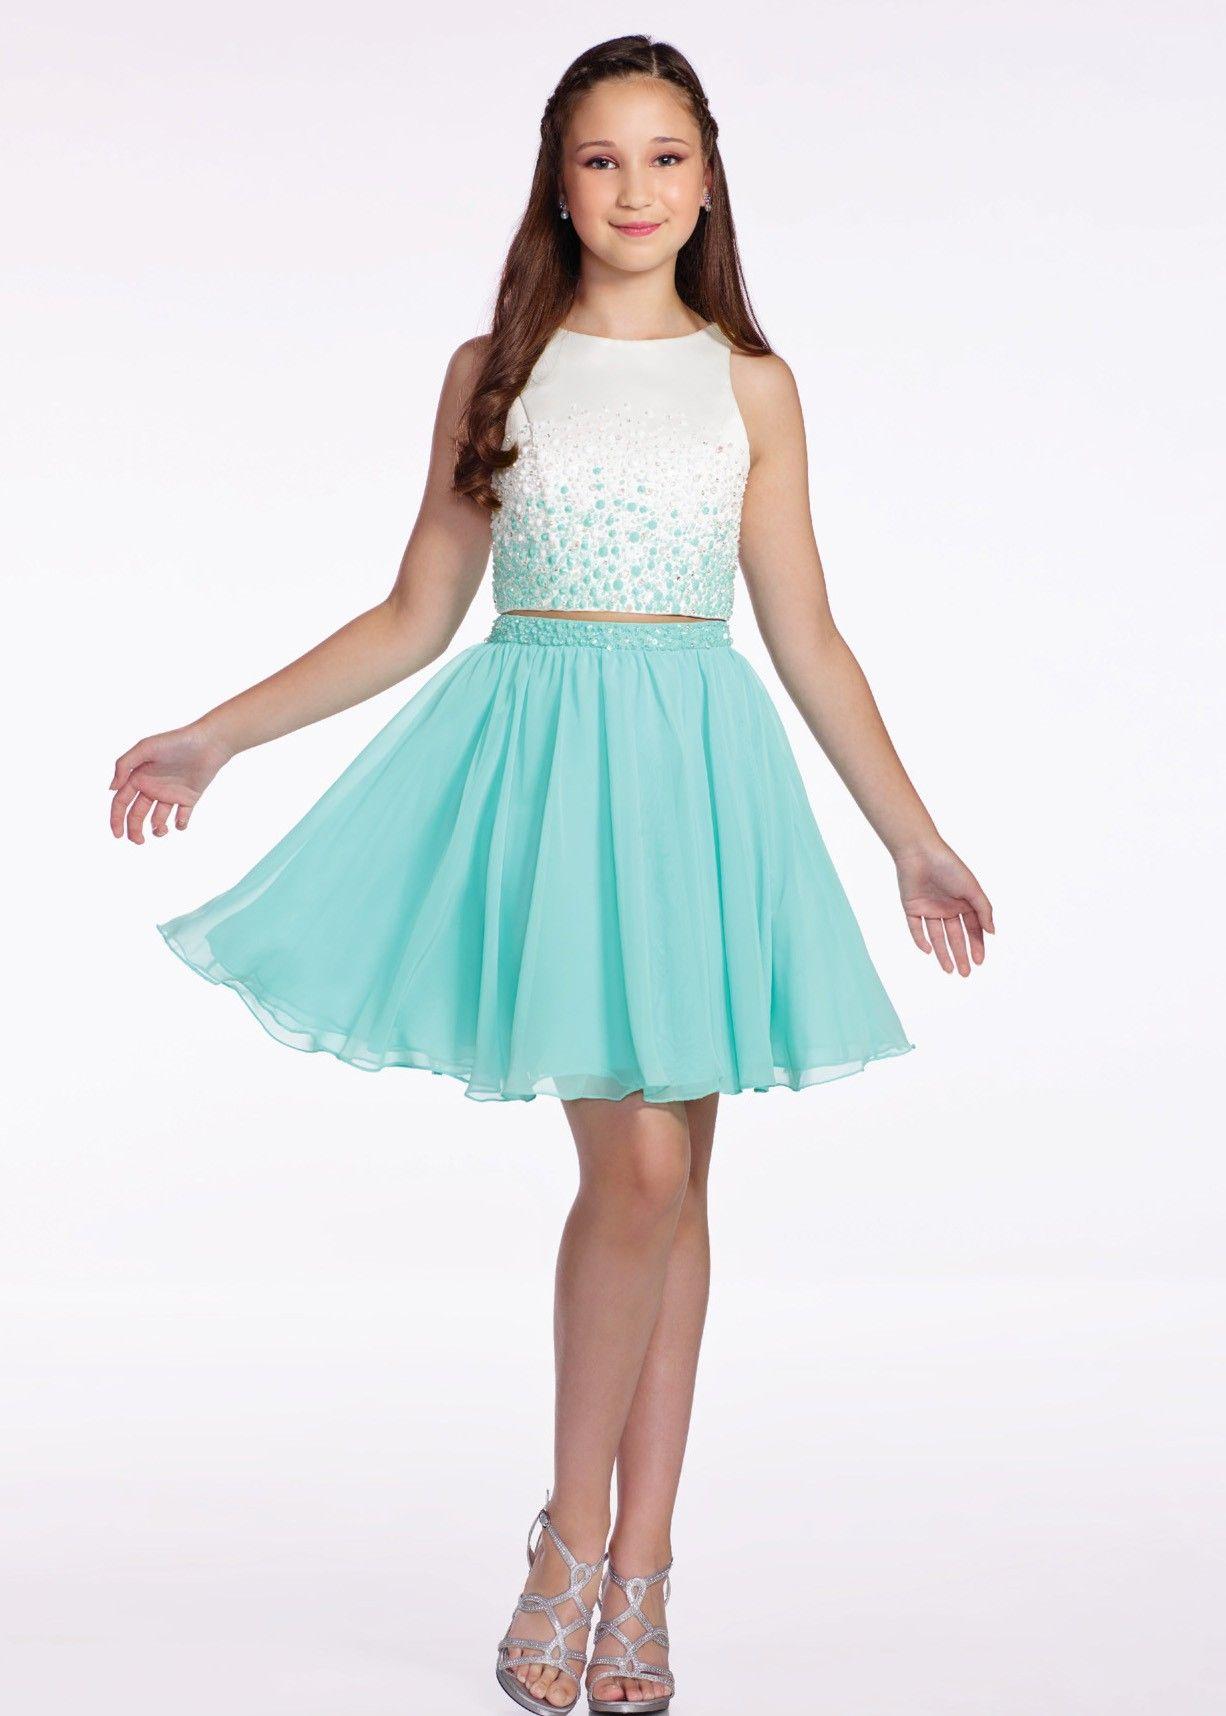 Lexie by Mon Cheri TW11663 Aqua/Ivory Two Piece Ombre Beaded Dress ...